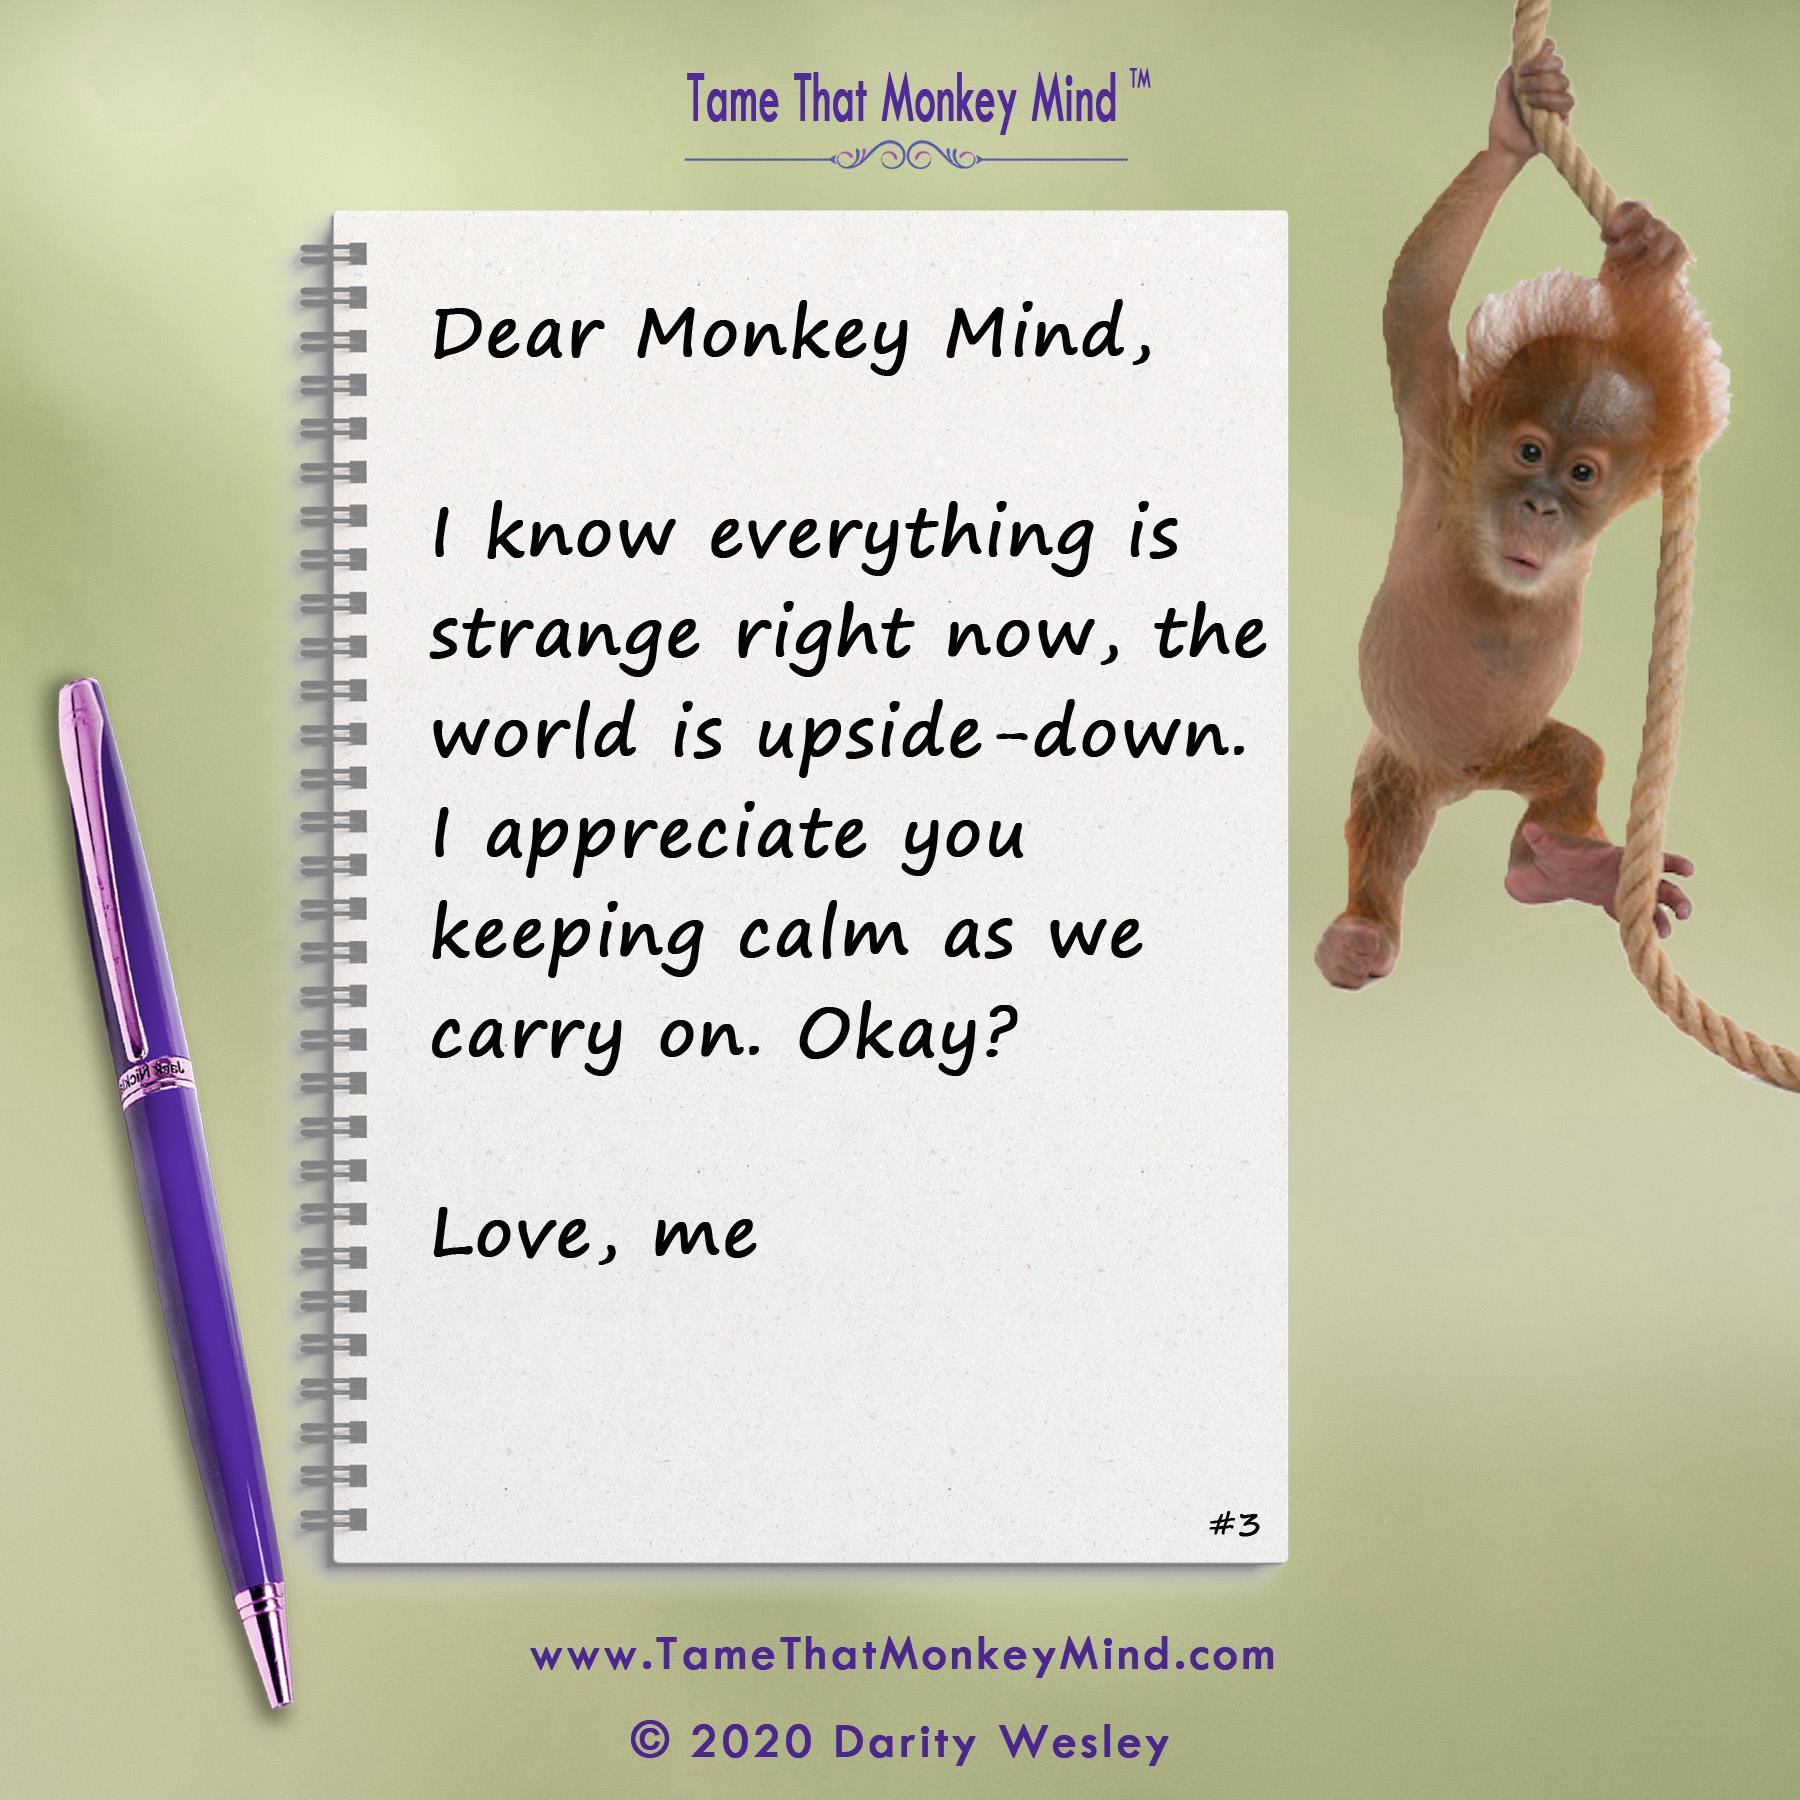 Dear Monkey Mind #3